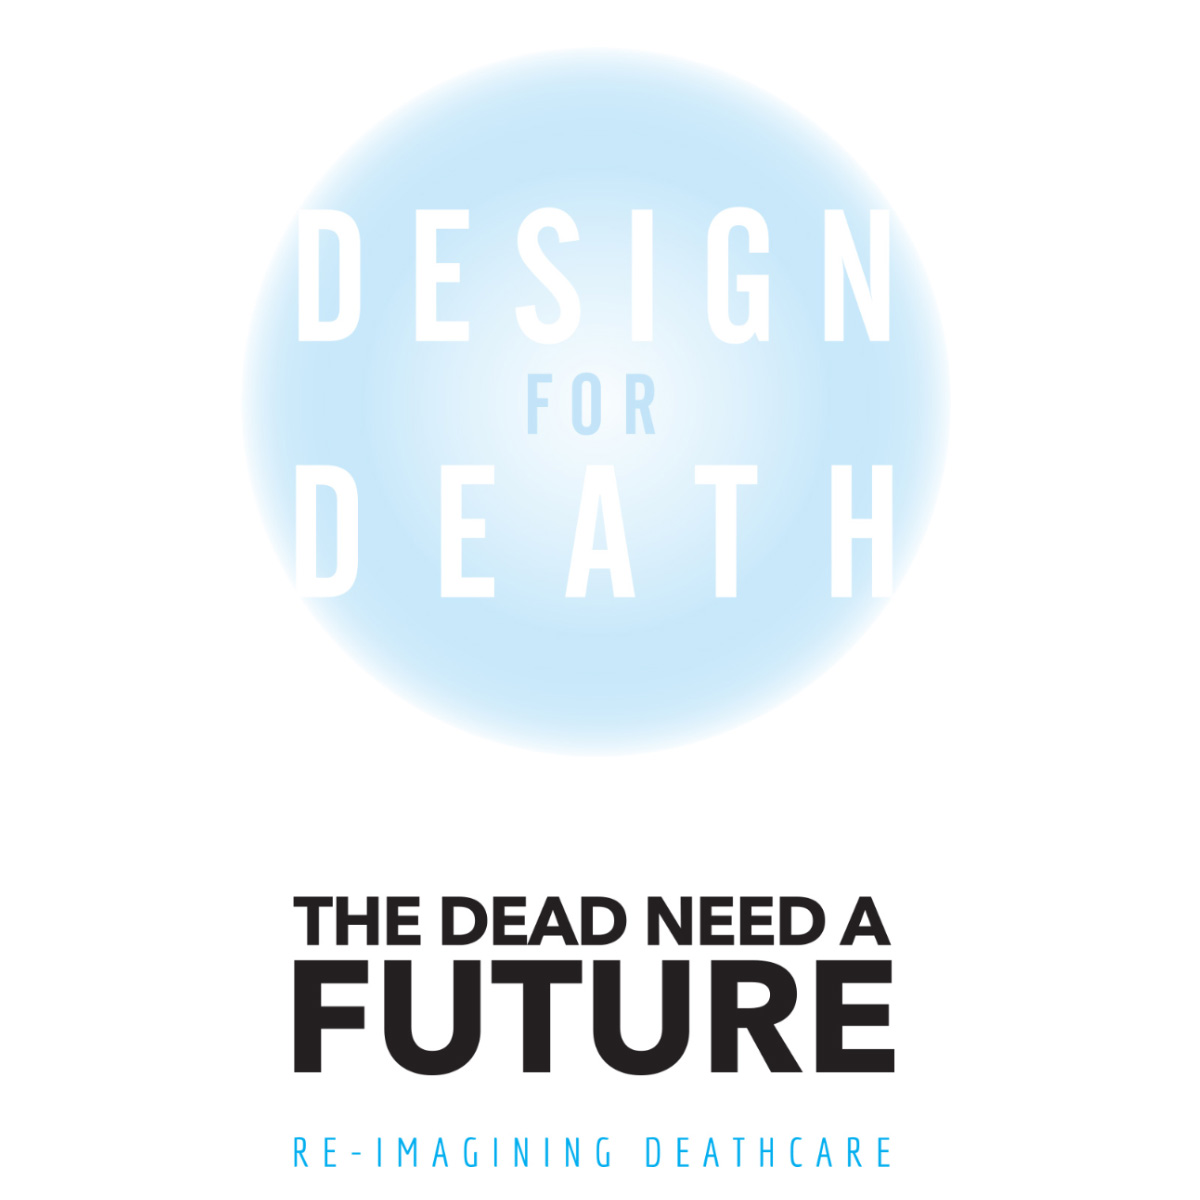 design-for-death-thumbnail